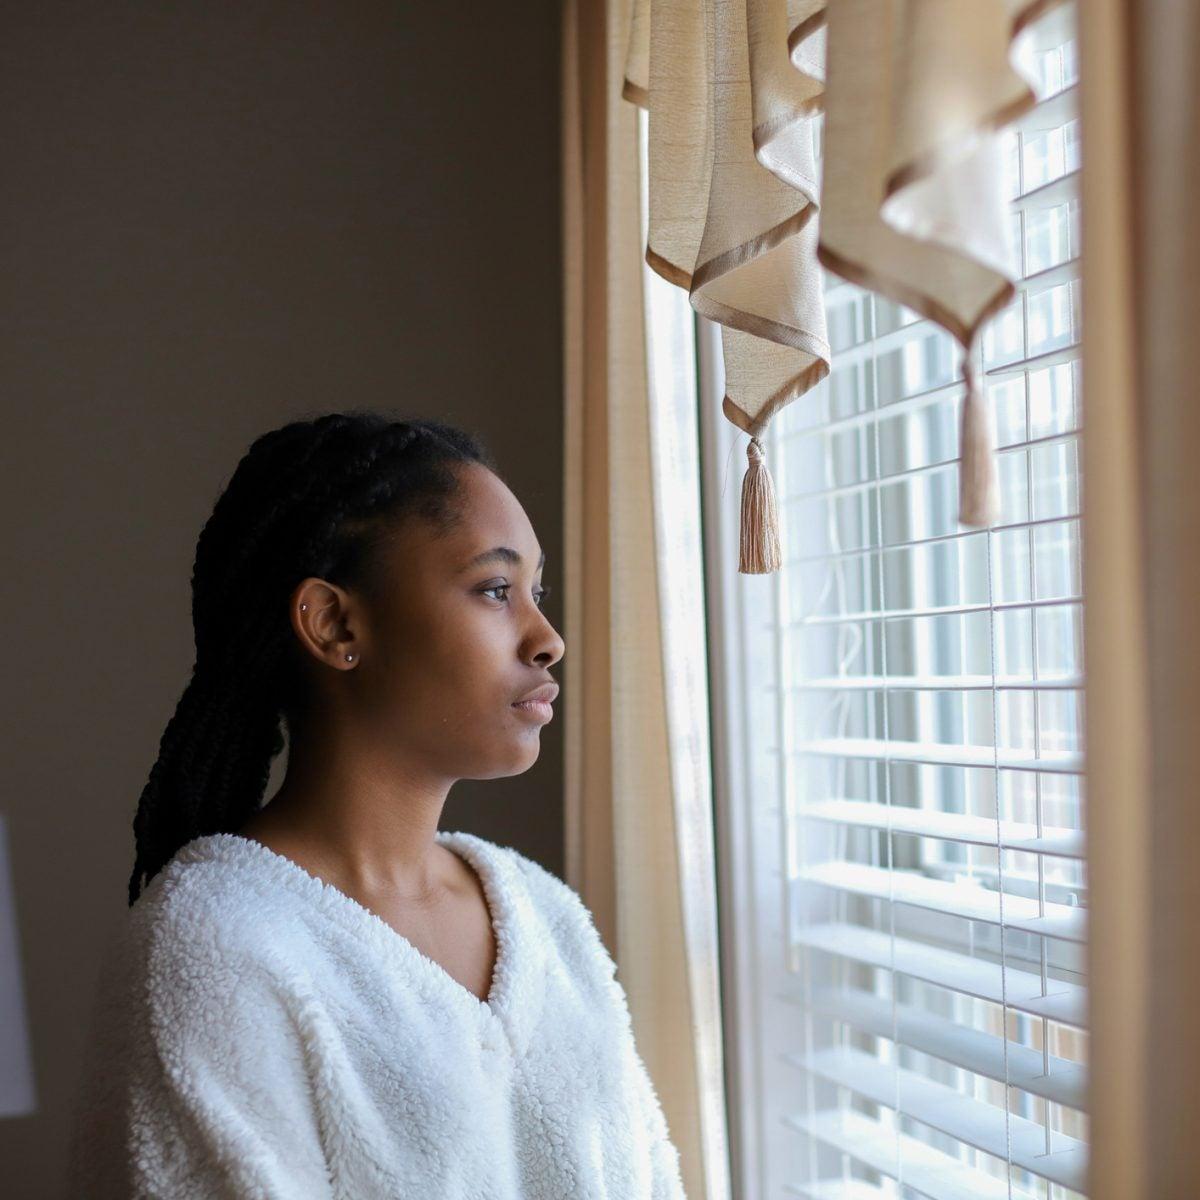 5 Organizations That Support Black Women's Mental Health